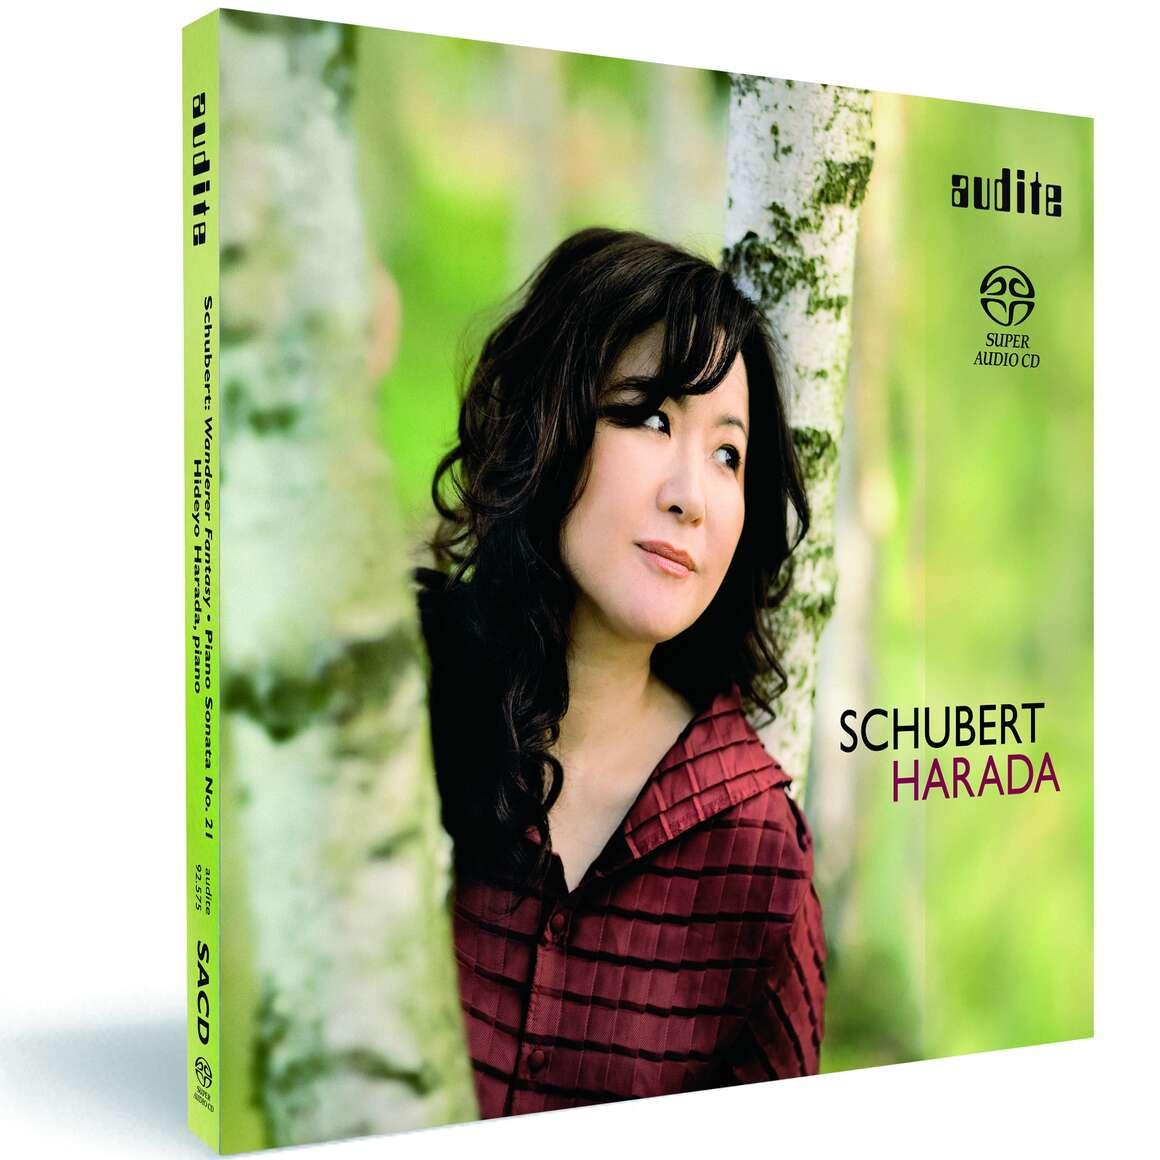 Franz Schubert: Wanderer Fantasy & Piano Sonata No. 21